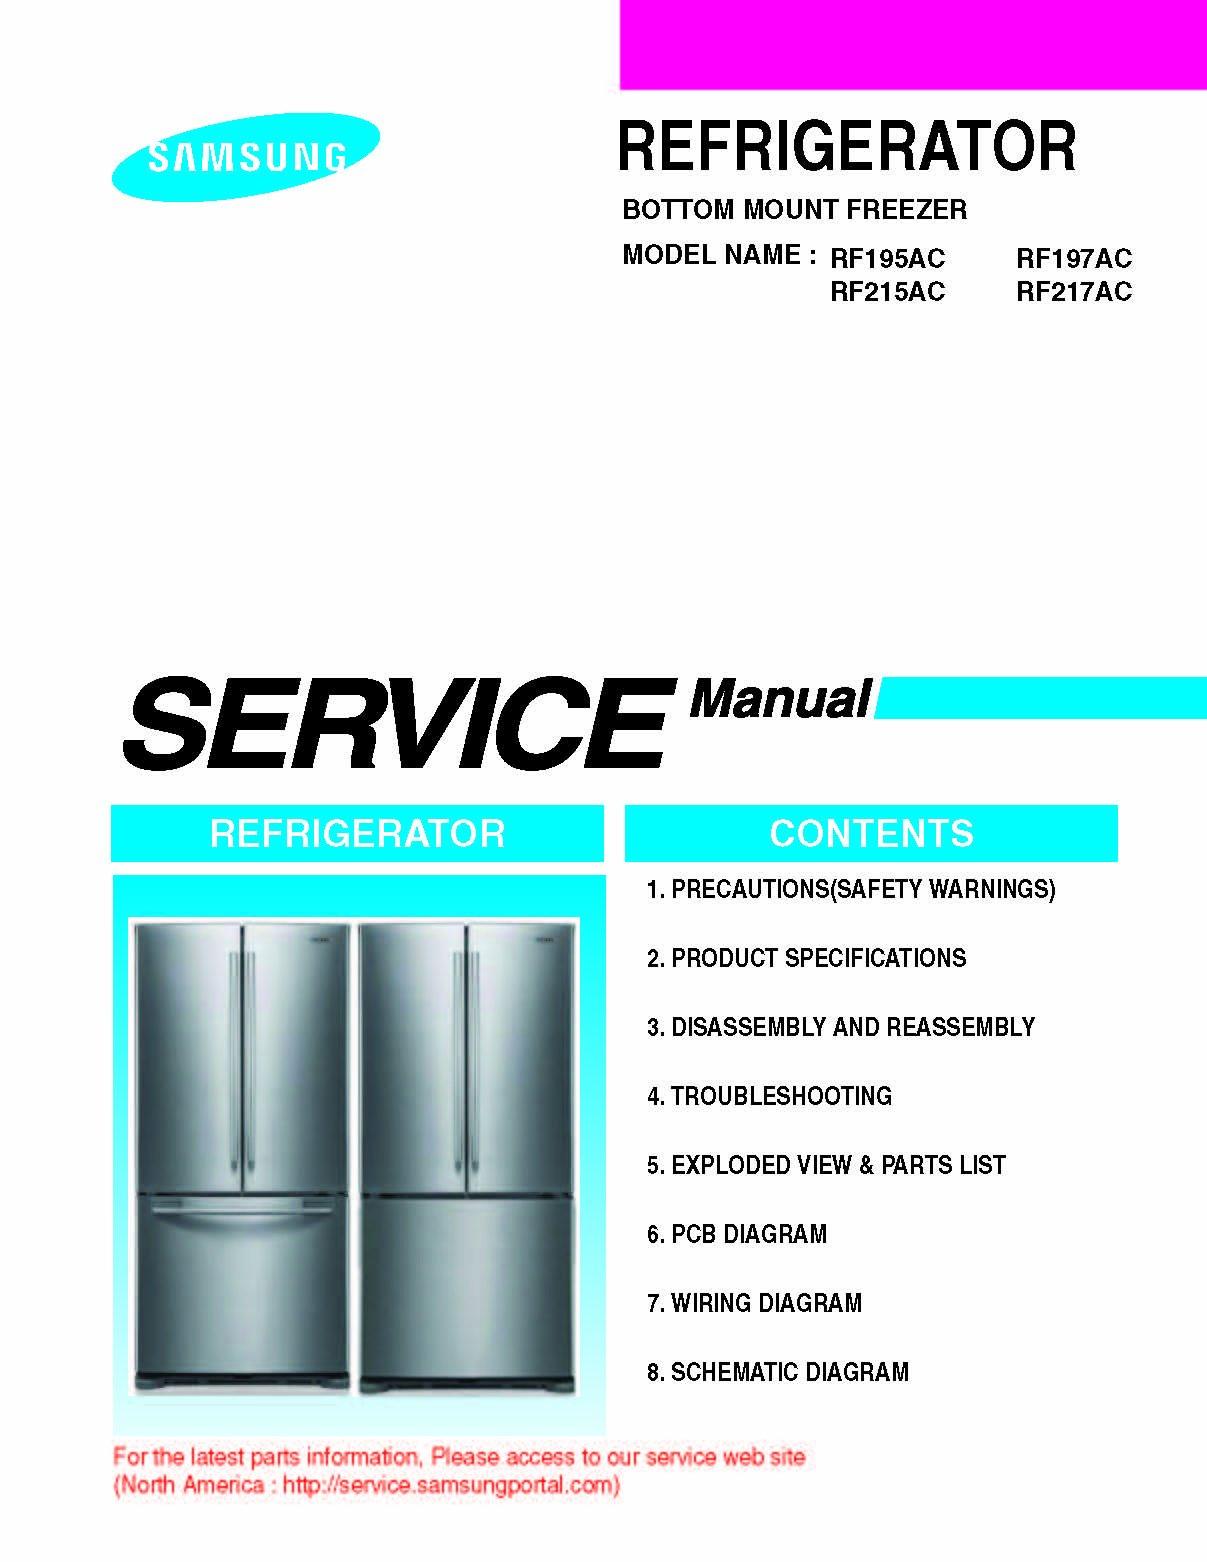 Samsung RF217ACRS/XAA Service manual AND RF217ACPN/XAA Service manual and  RF217ACBP/XAA Service manual: Samsung: Amazon.com: Books